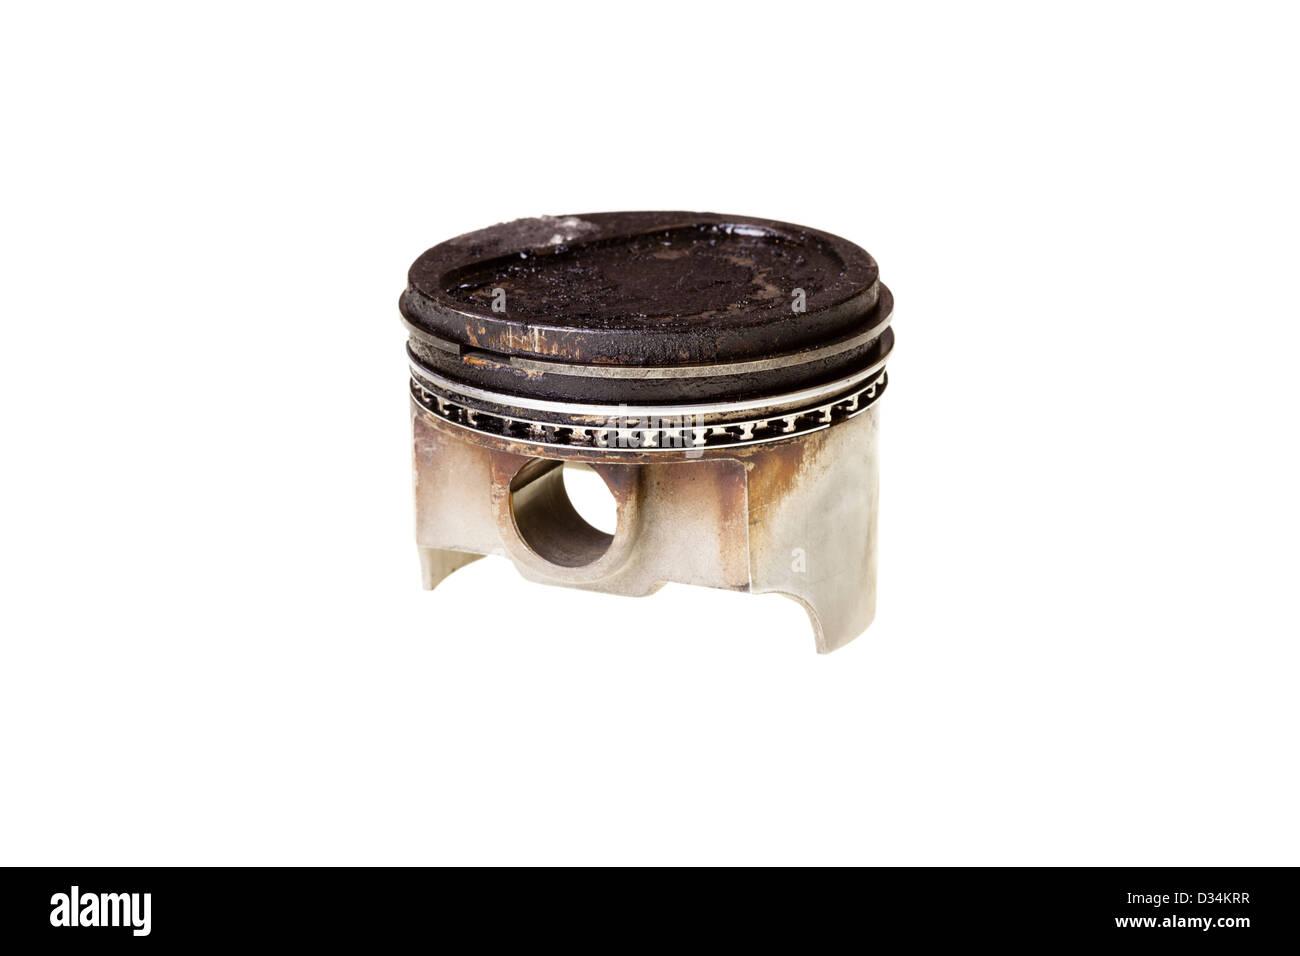 Engine piston deposits - Stock Image